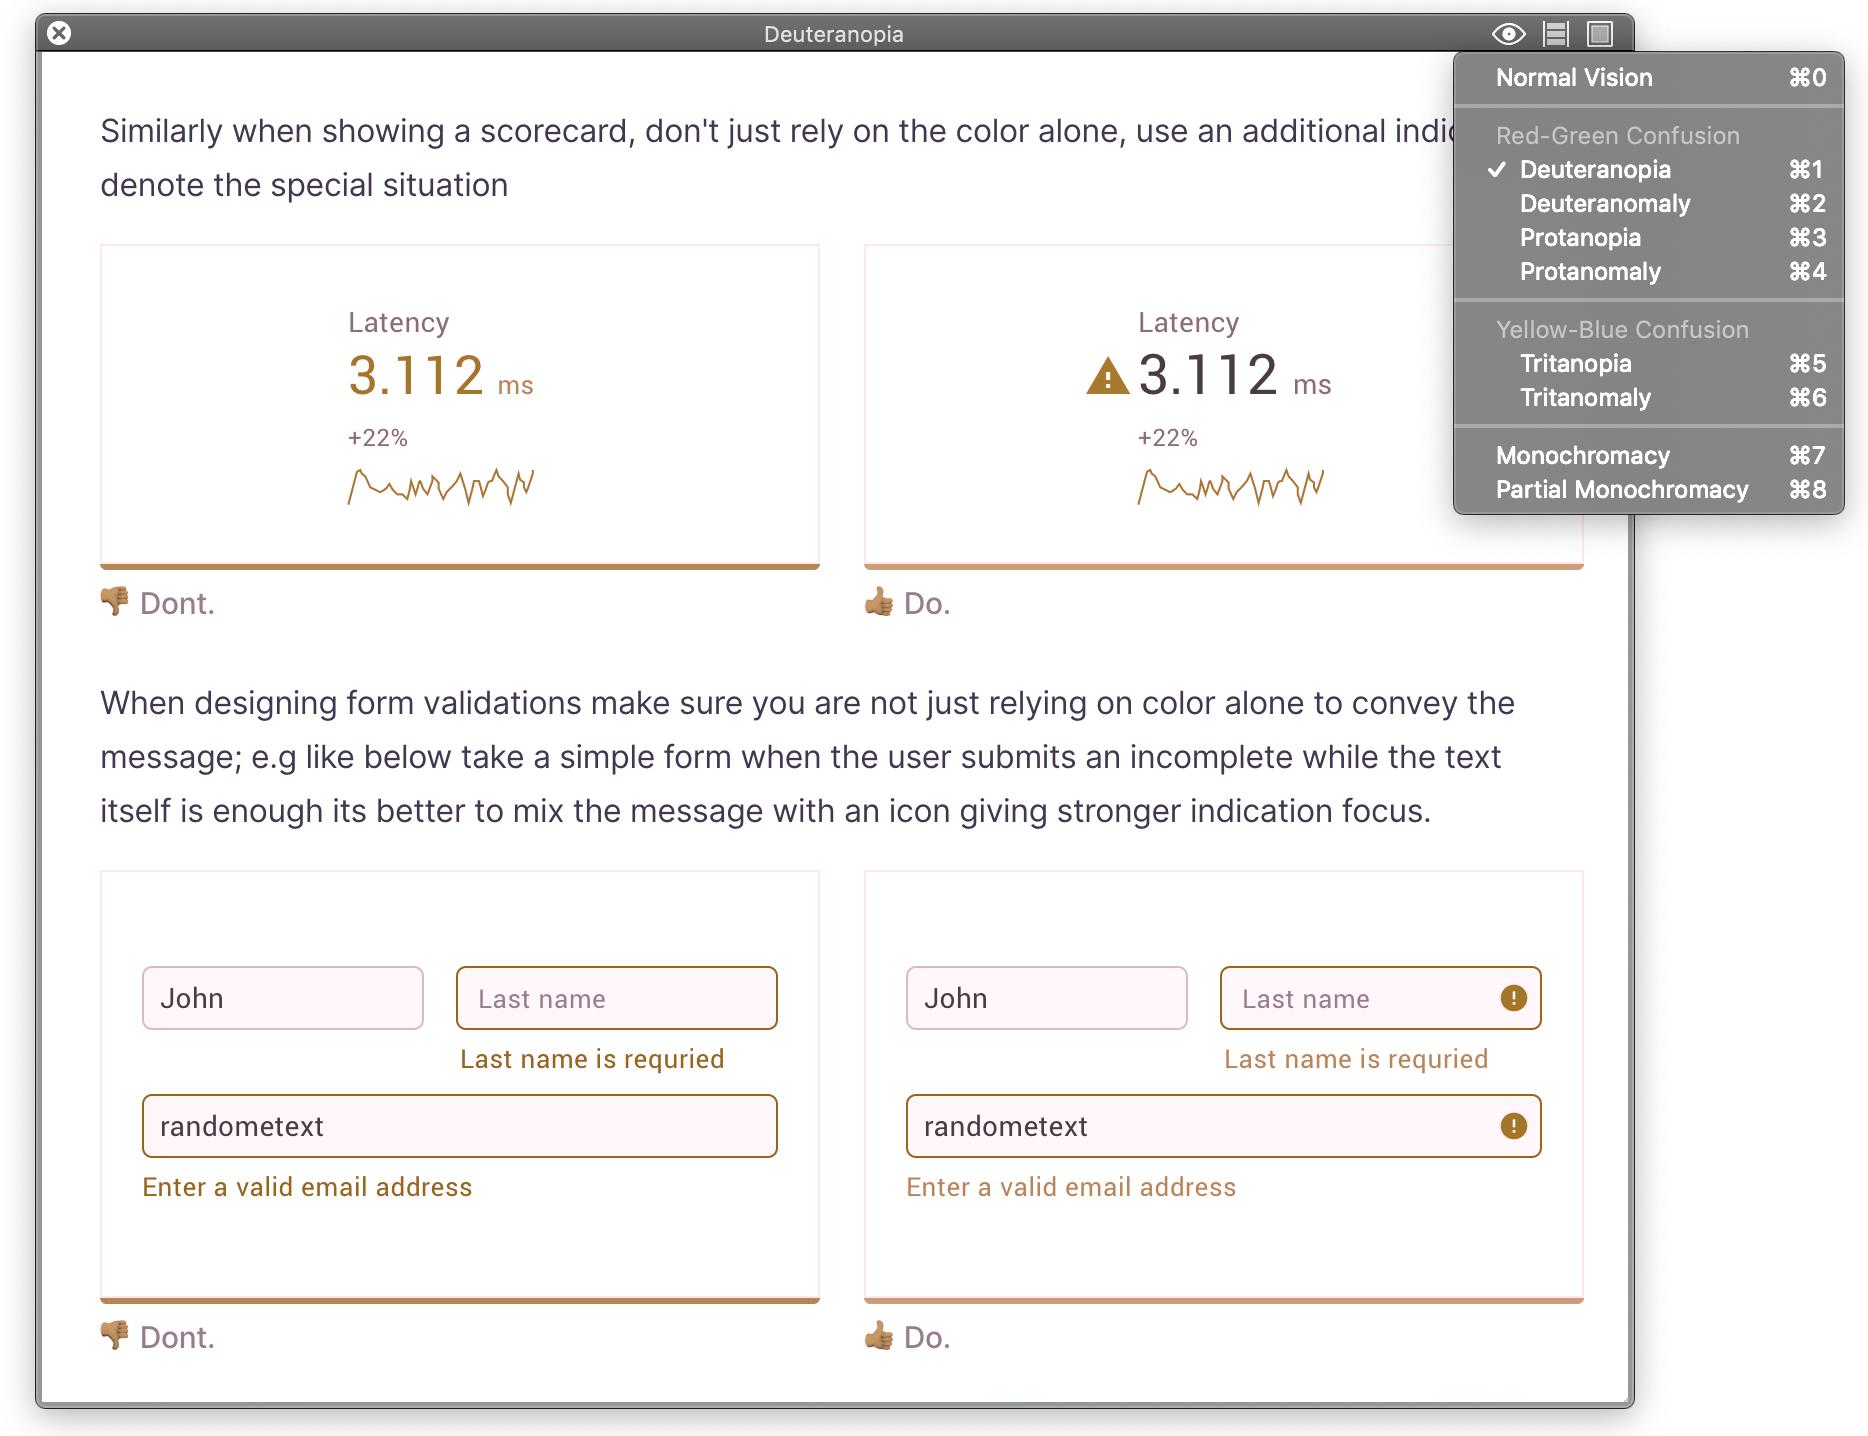 Screenshot of Sim Daltonism software